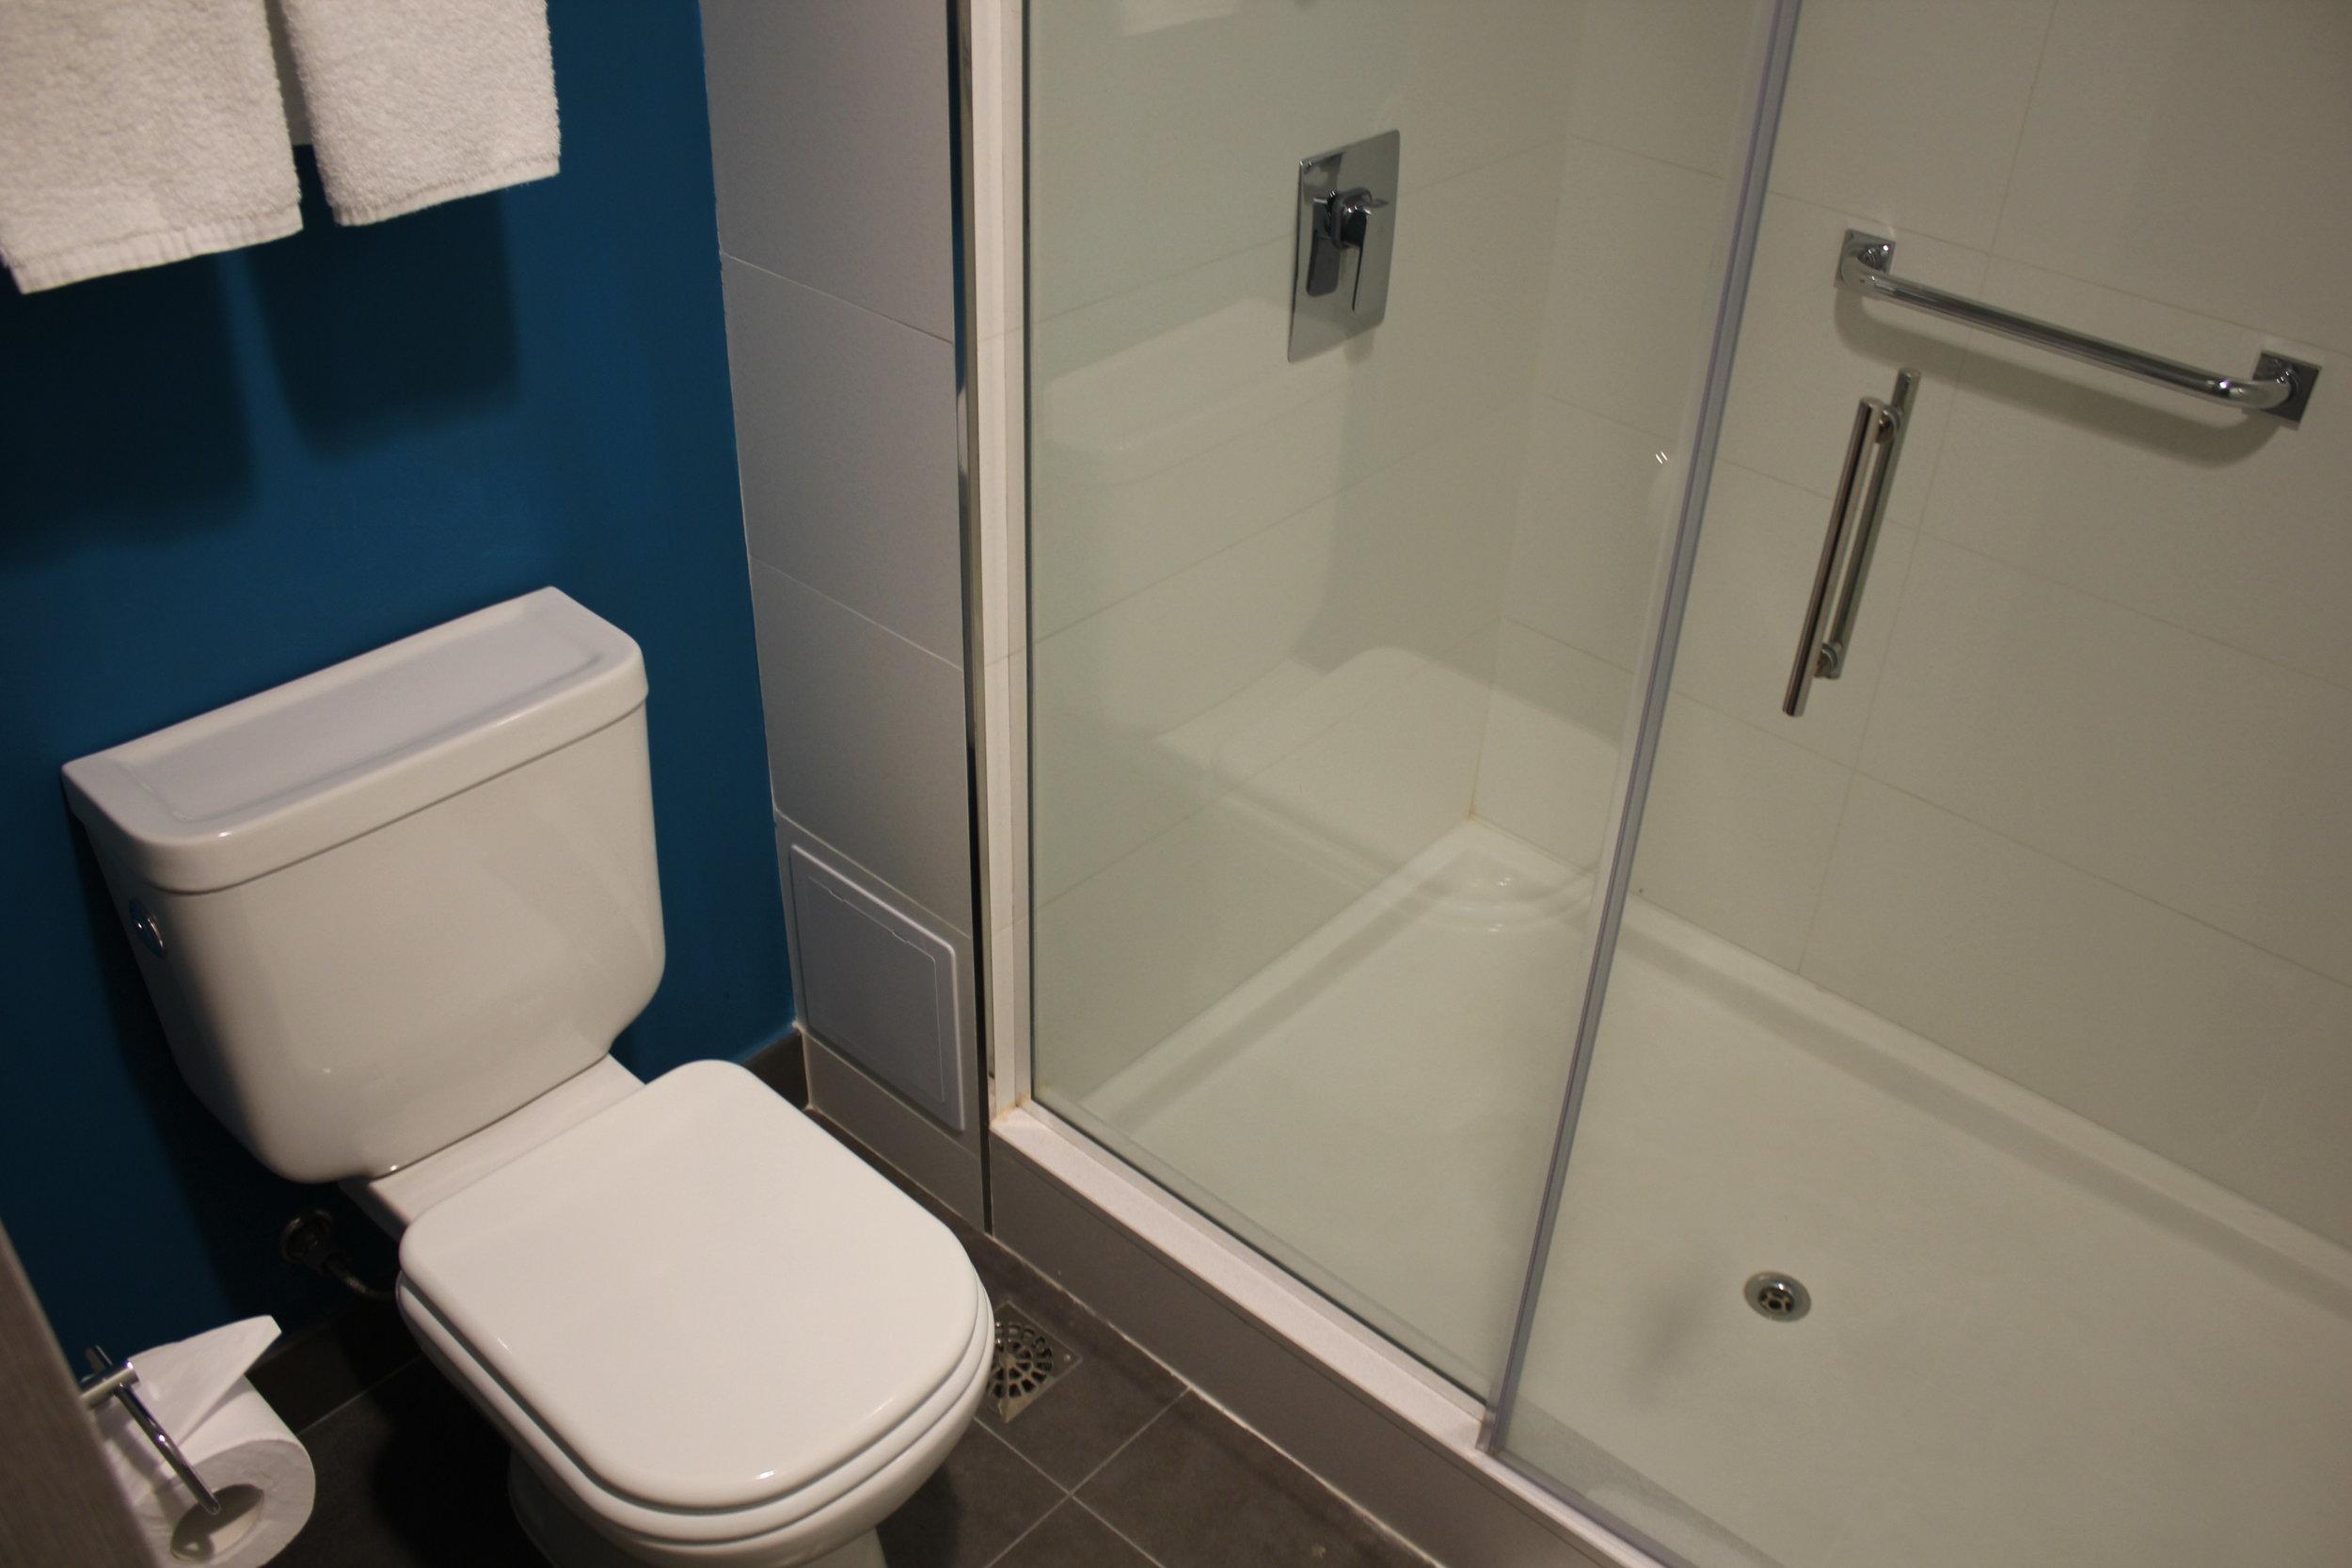 Aloft Montevideo – Toilet and shower